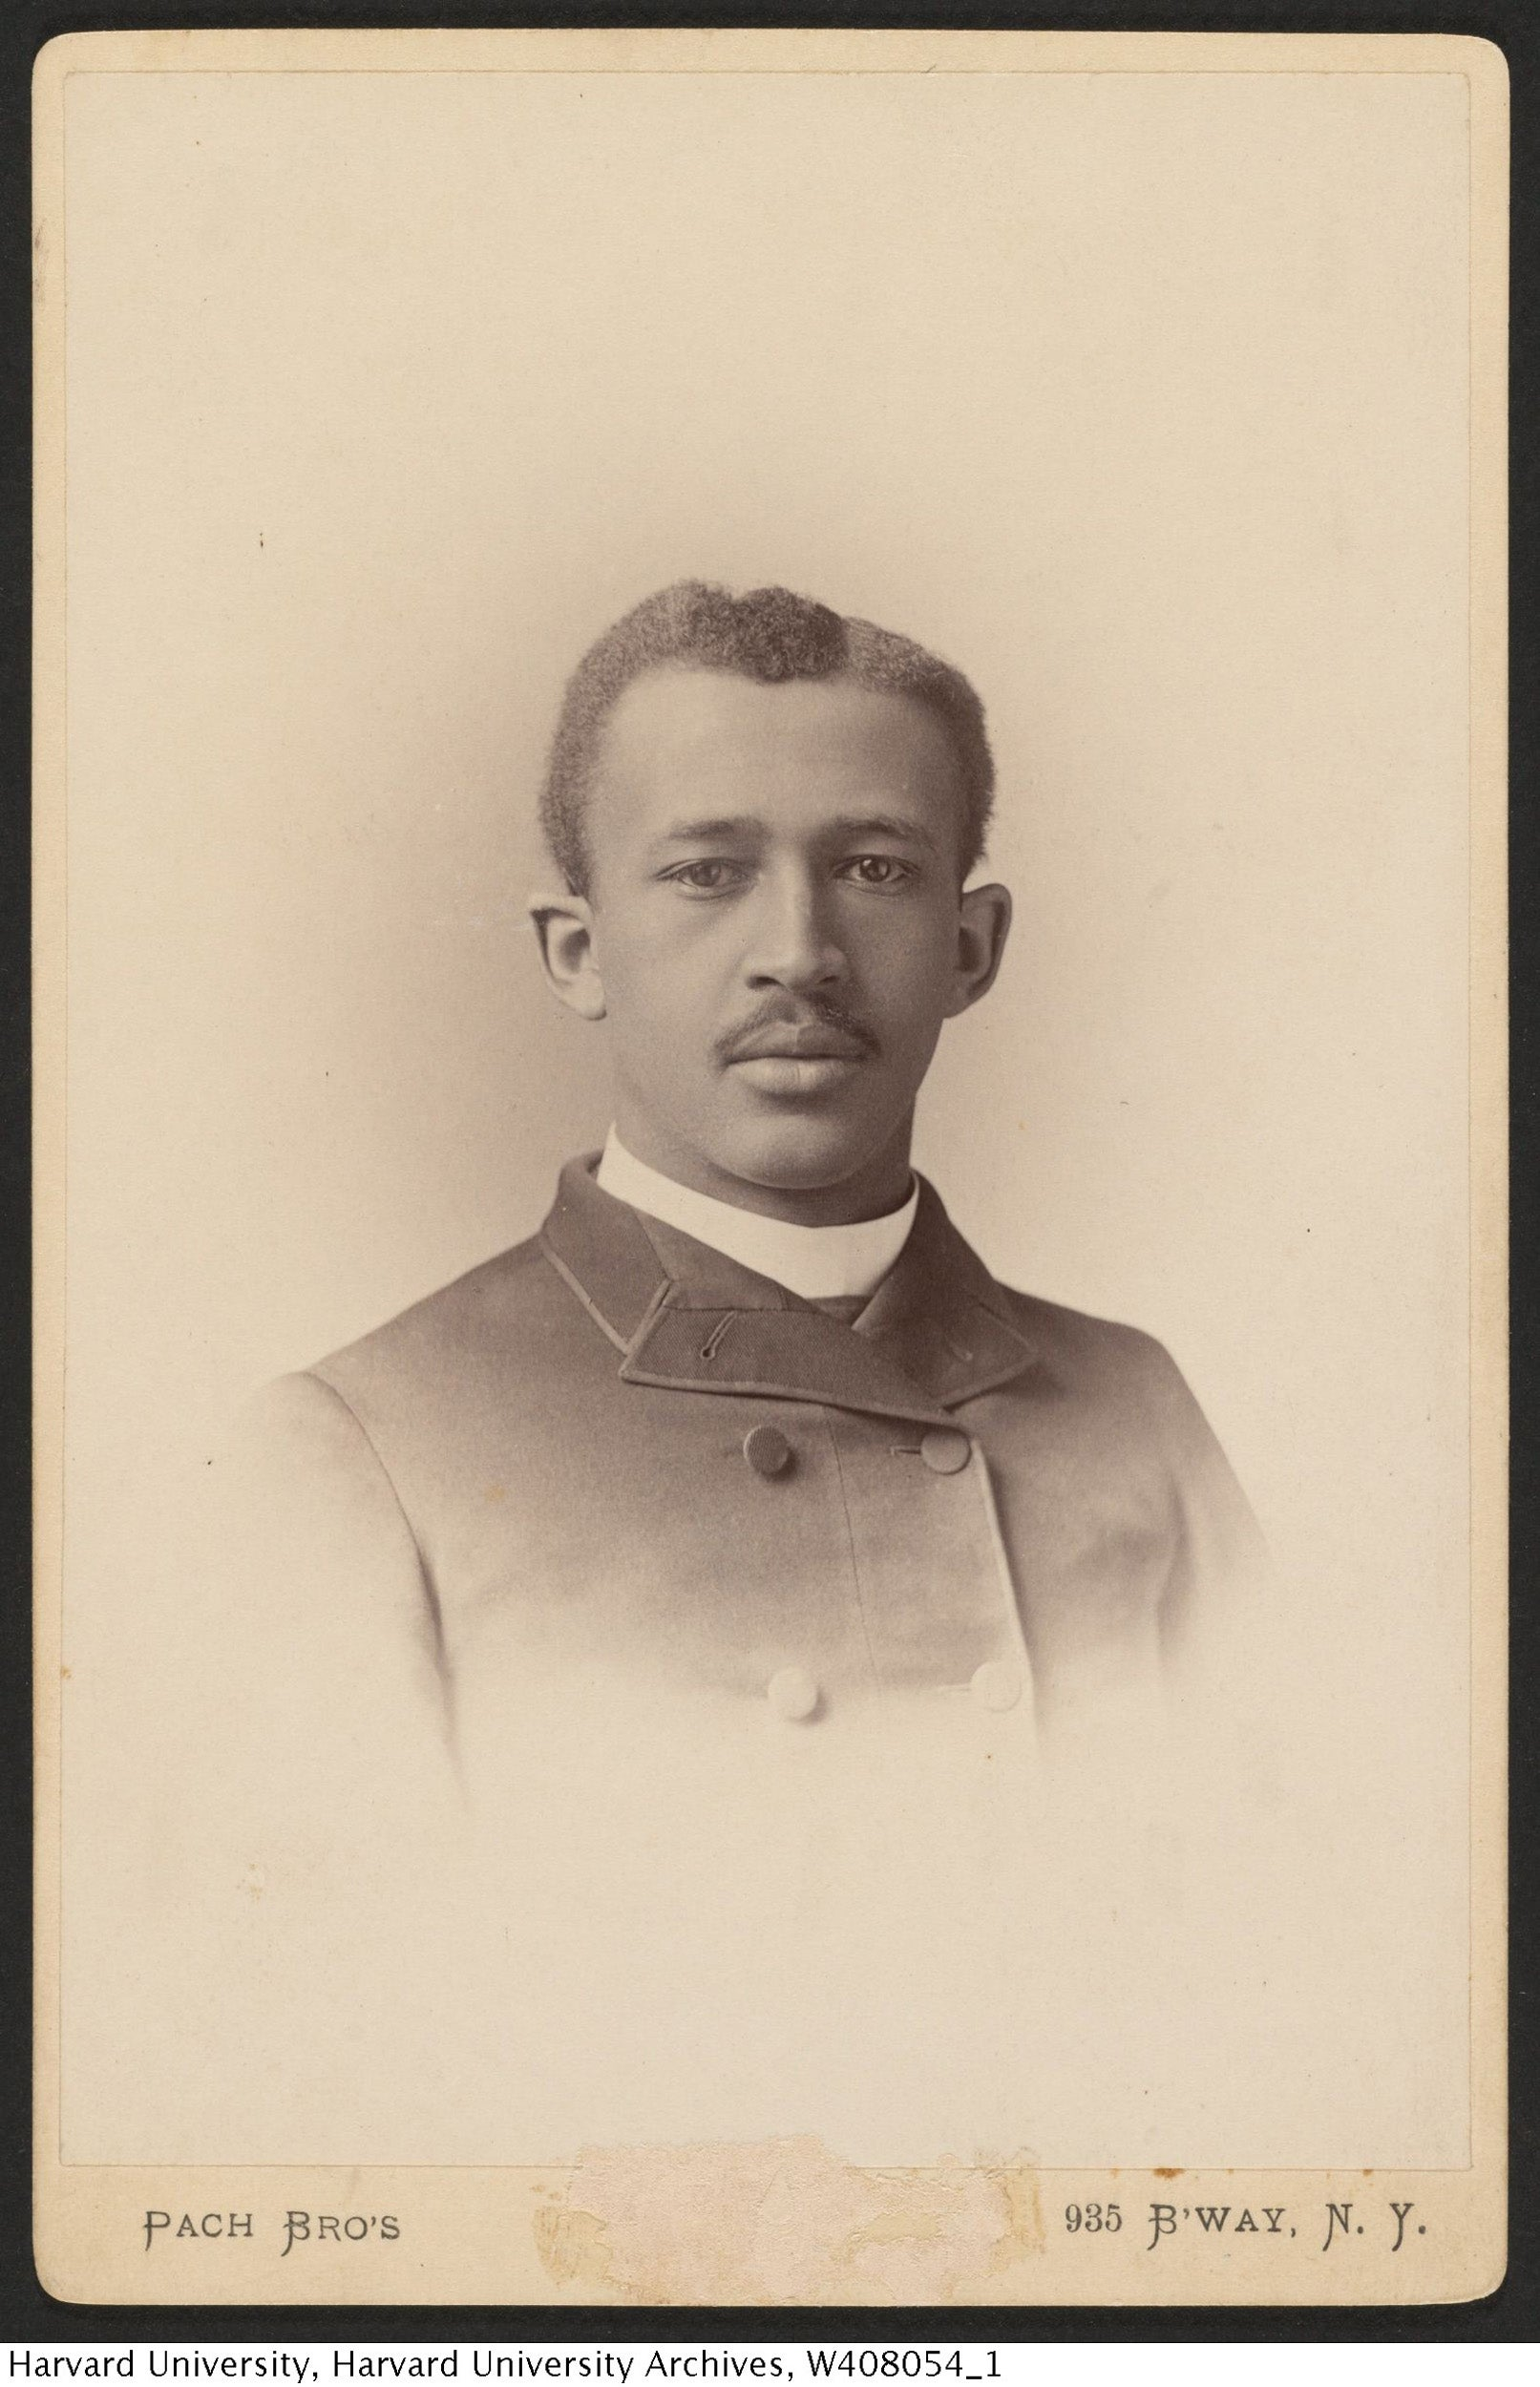 W. E. B. Du Bois photograph from the Harvard College Class of 1890 Class Book, 1890.